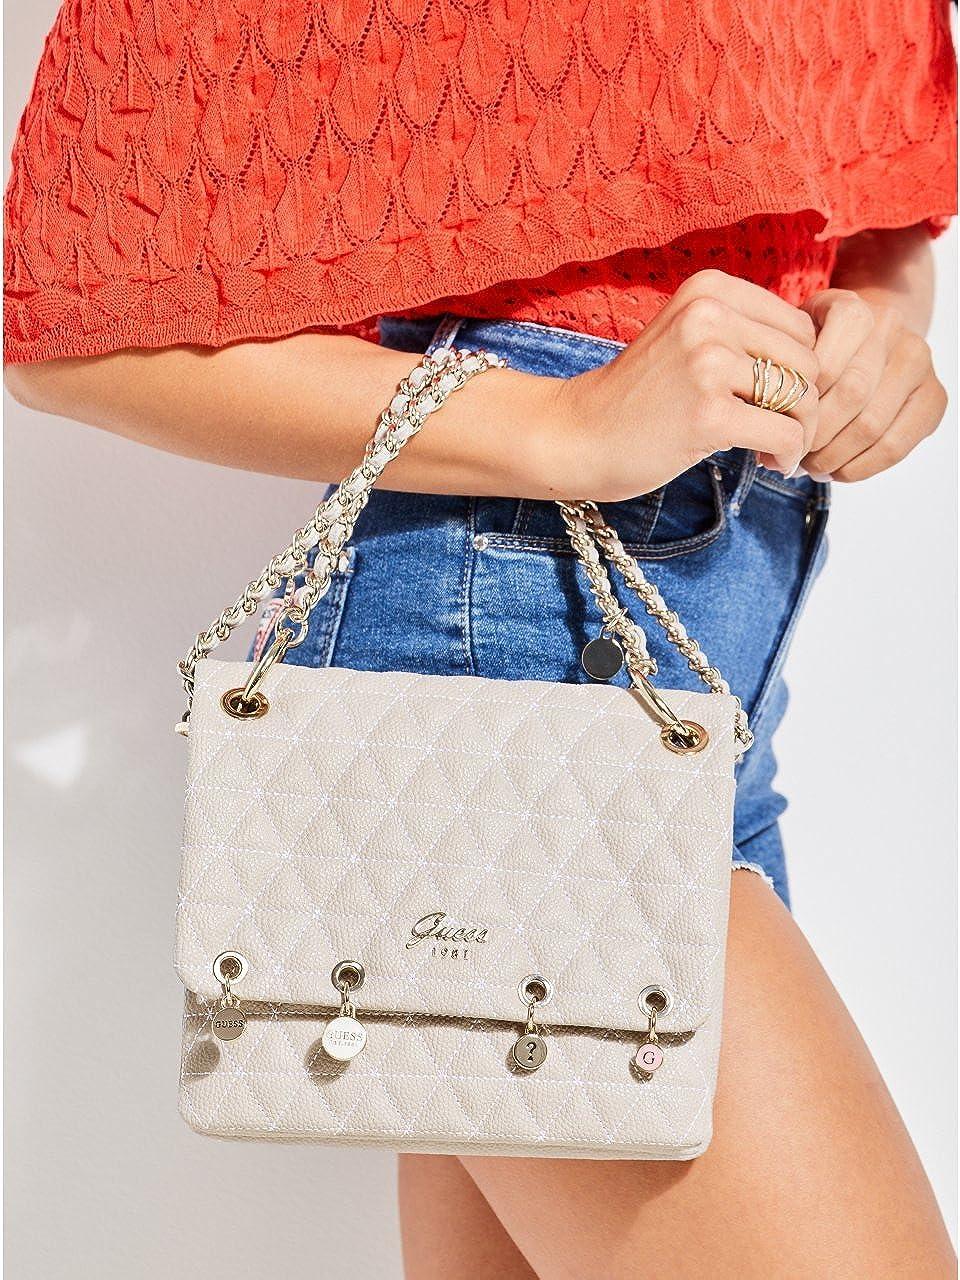 Guess Fleur Crossbody Flap Bag Cloud: Amazon.it: Scarpe e borse